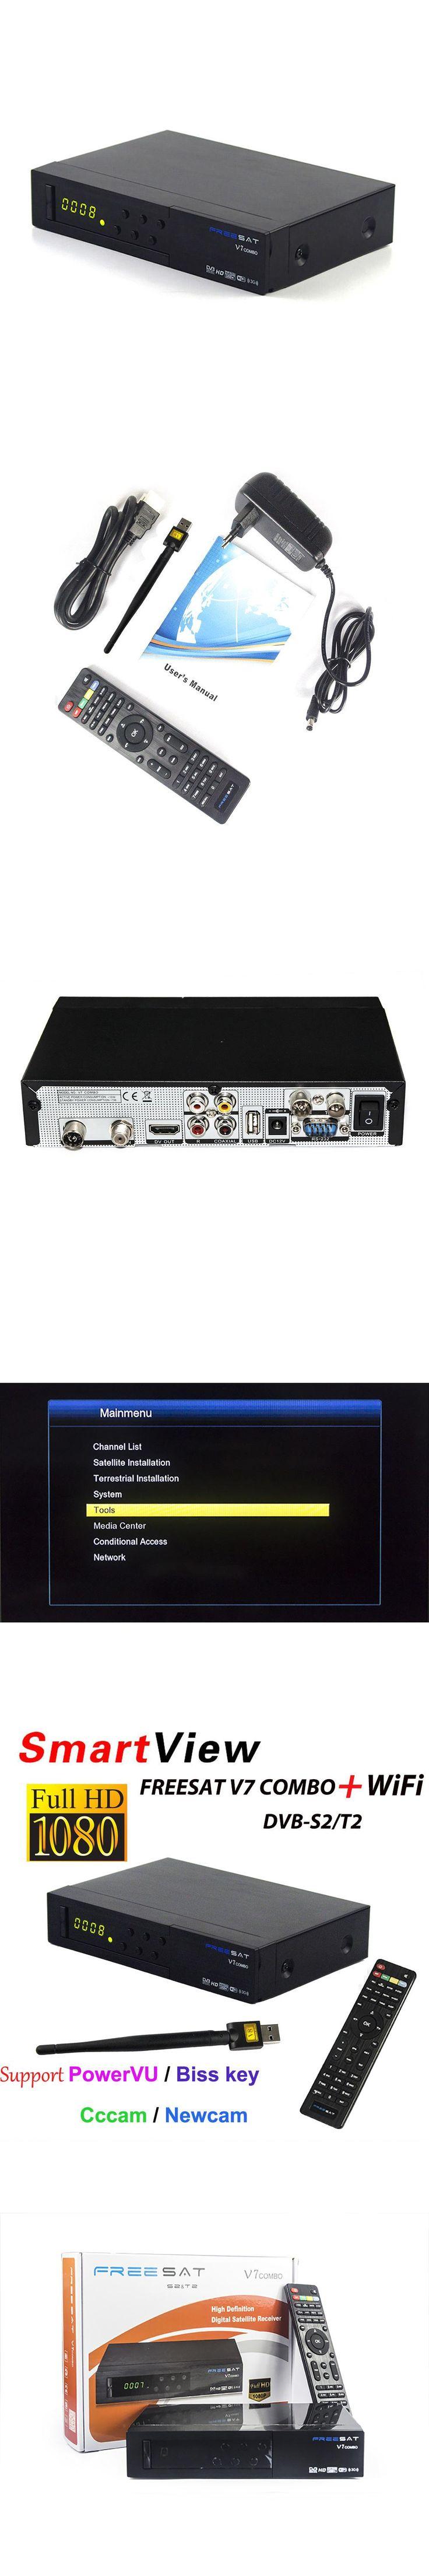 [Genuine] Freesat V7 Combo receptor HD Satellite Receiver DVB-S2 DVB-T2 Support PowerVu Biss Key Cccam Newcam Youtube DVB S2 T2